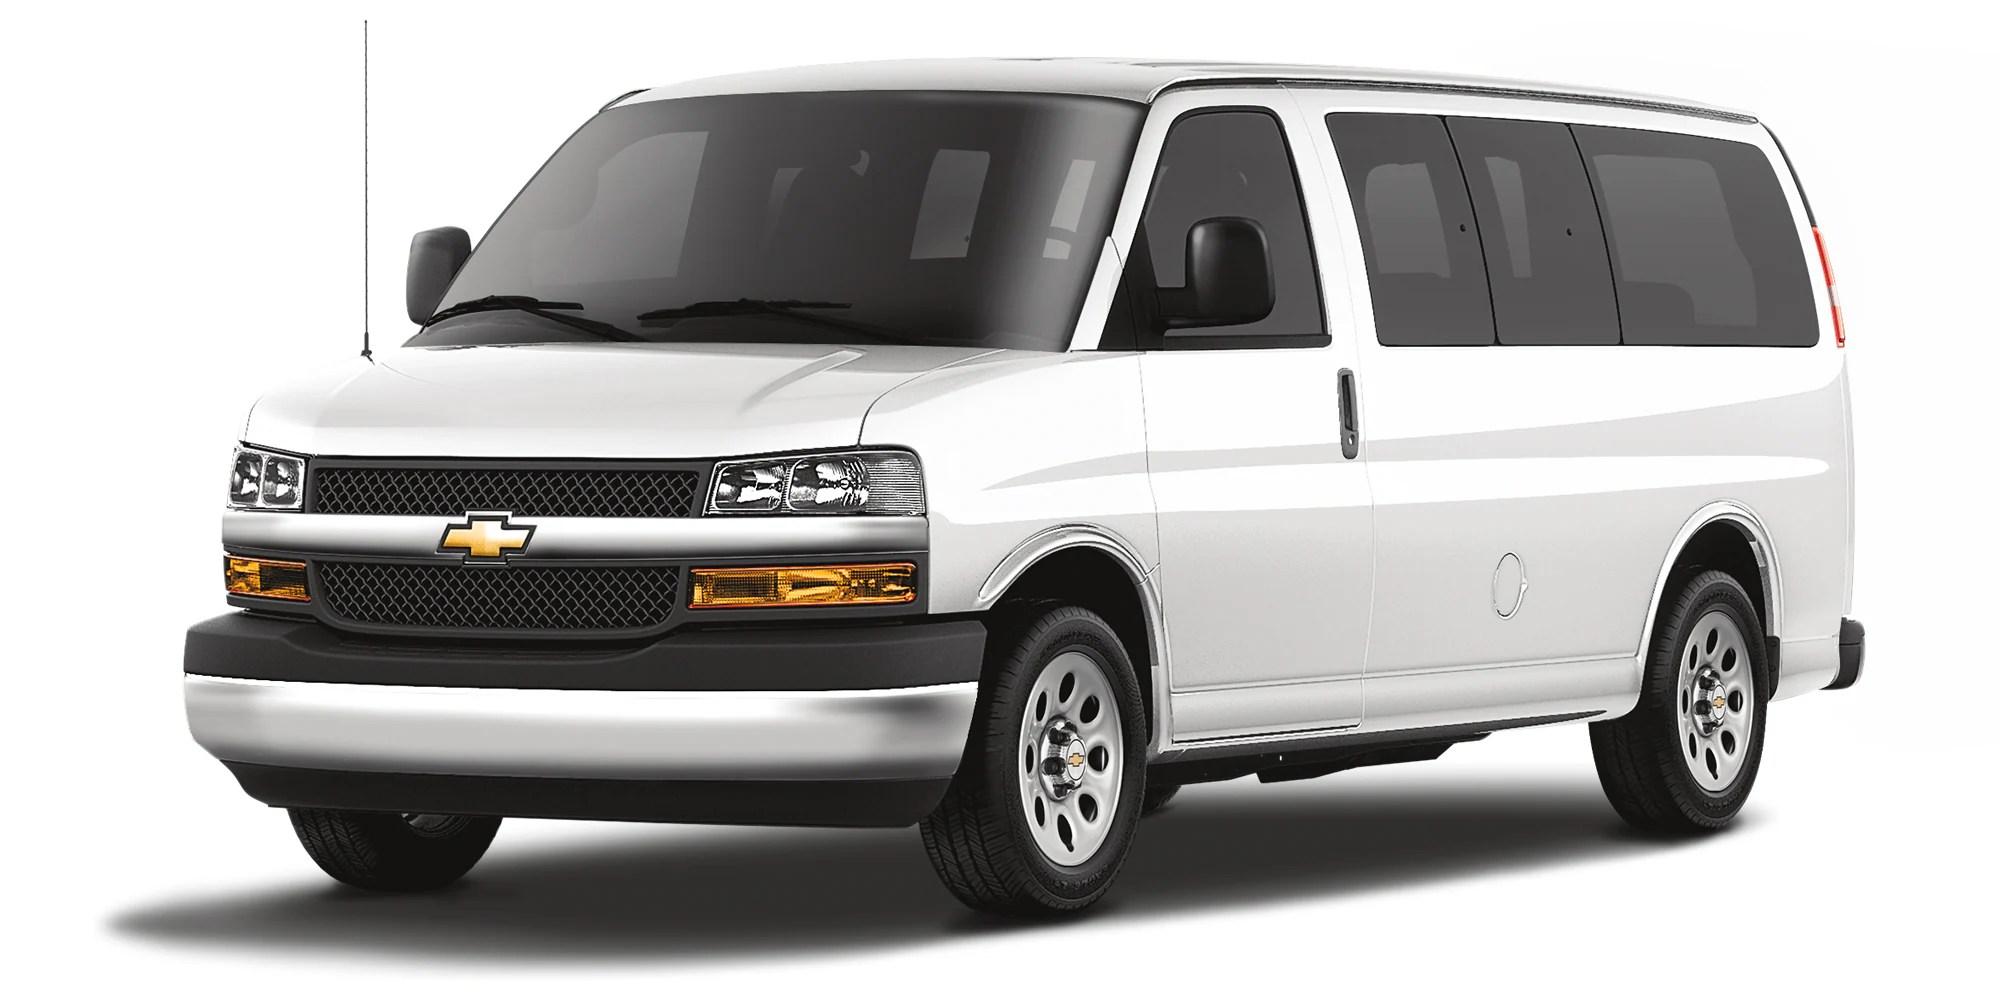 hight resolution of express 2019 camioneta van color blanco